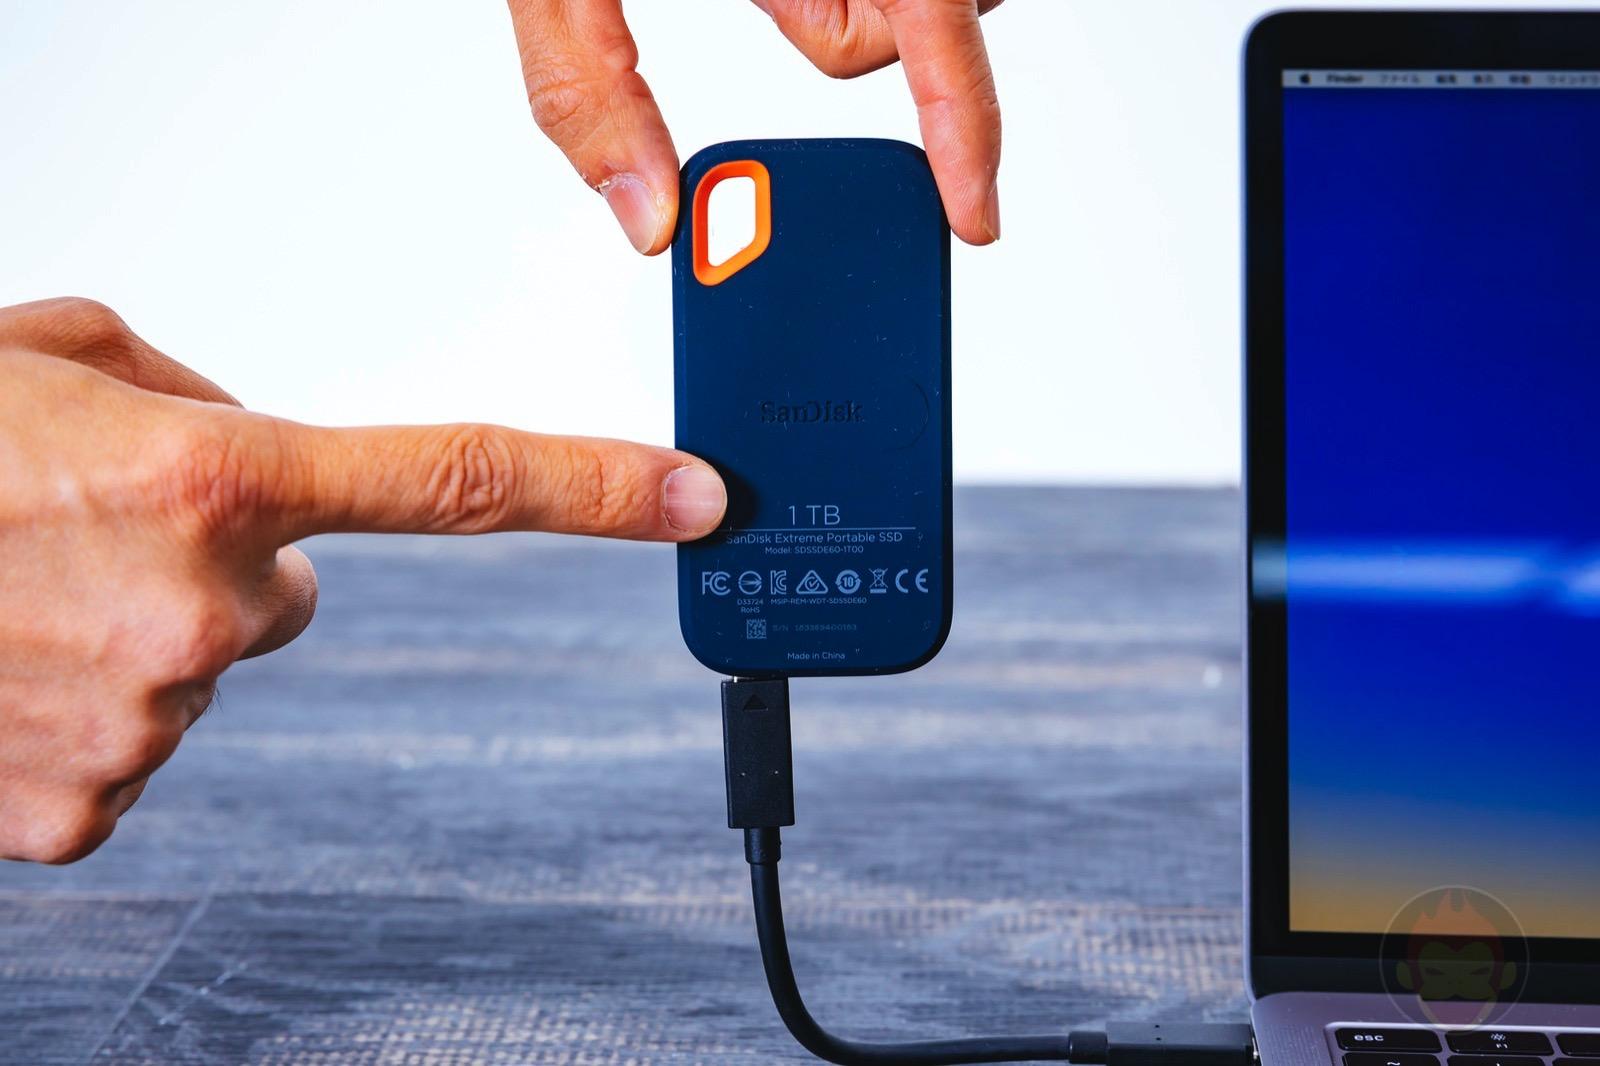 Sandisk-Extreme-Portable-1TB-SSD-09.jpg